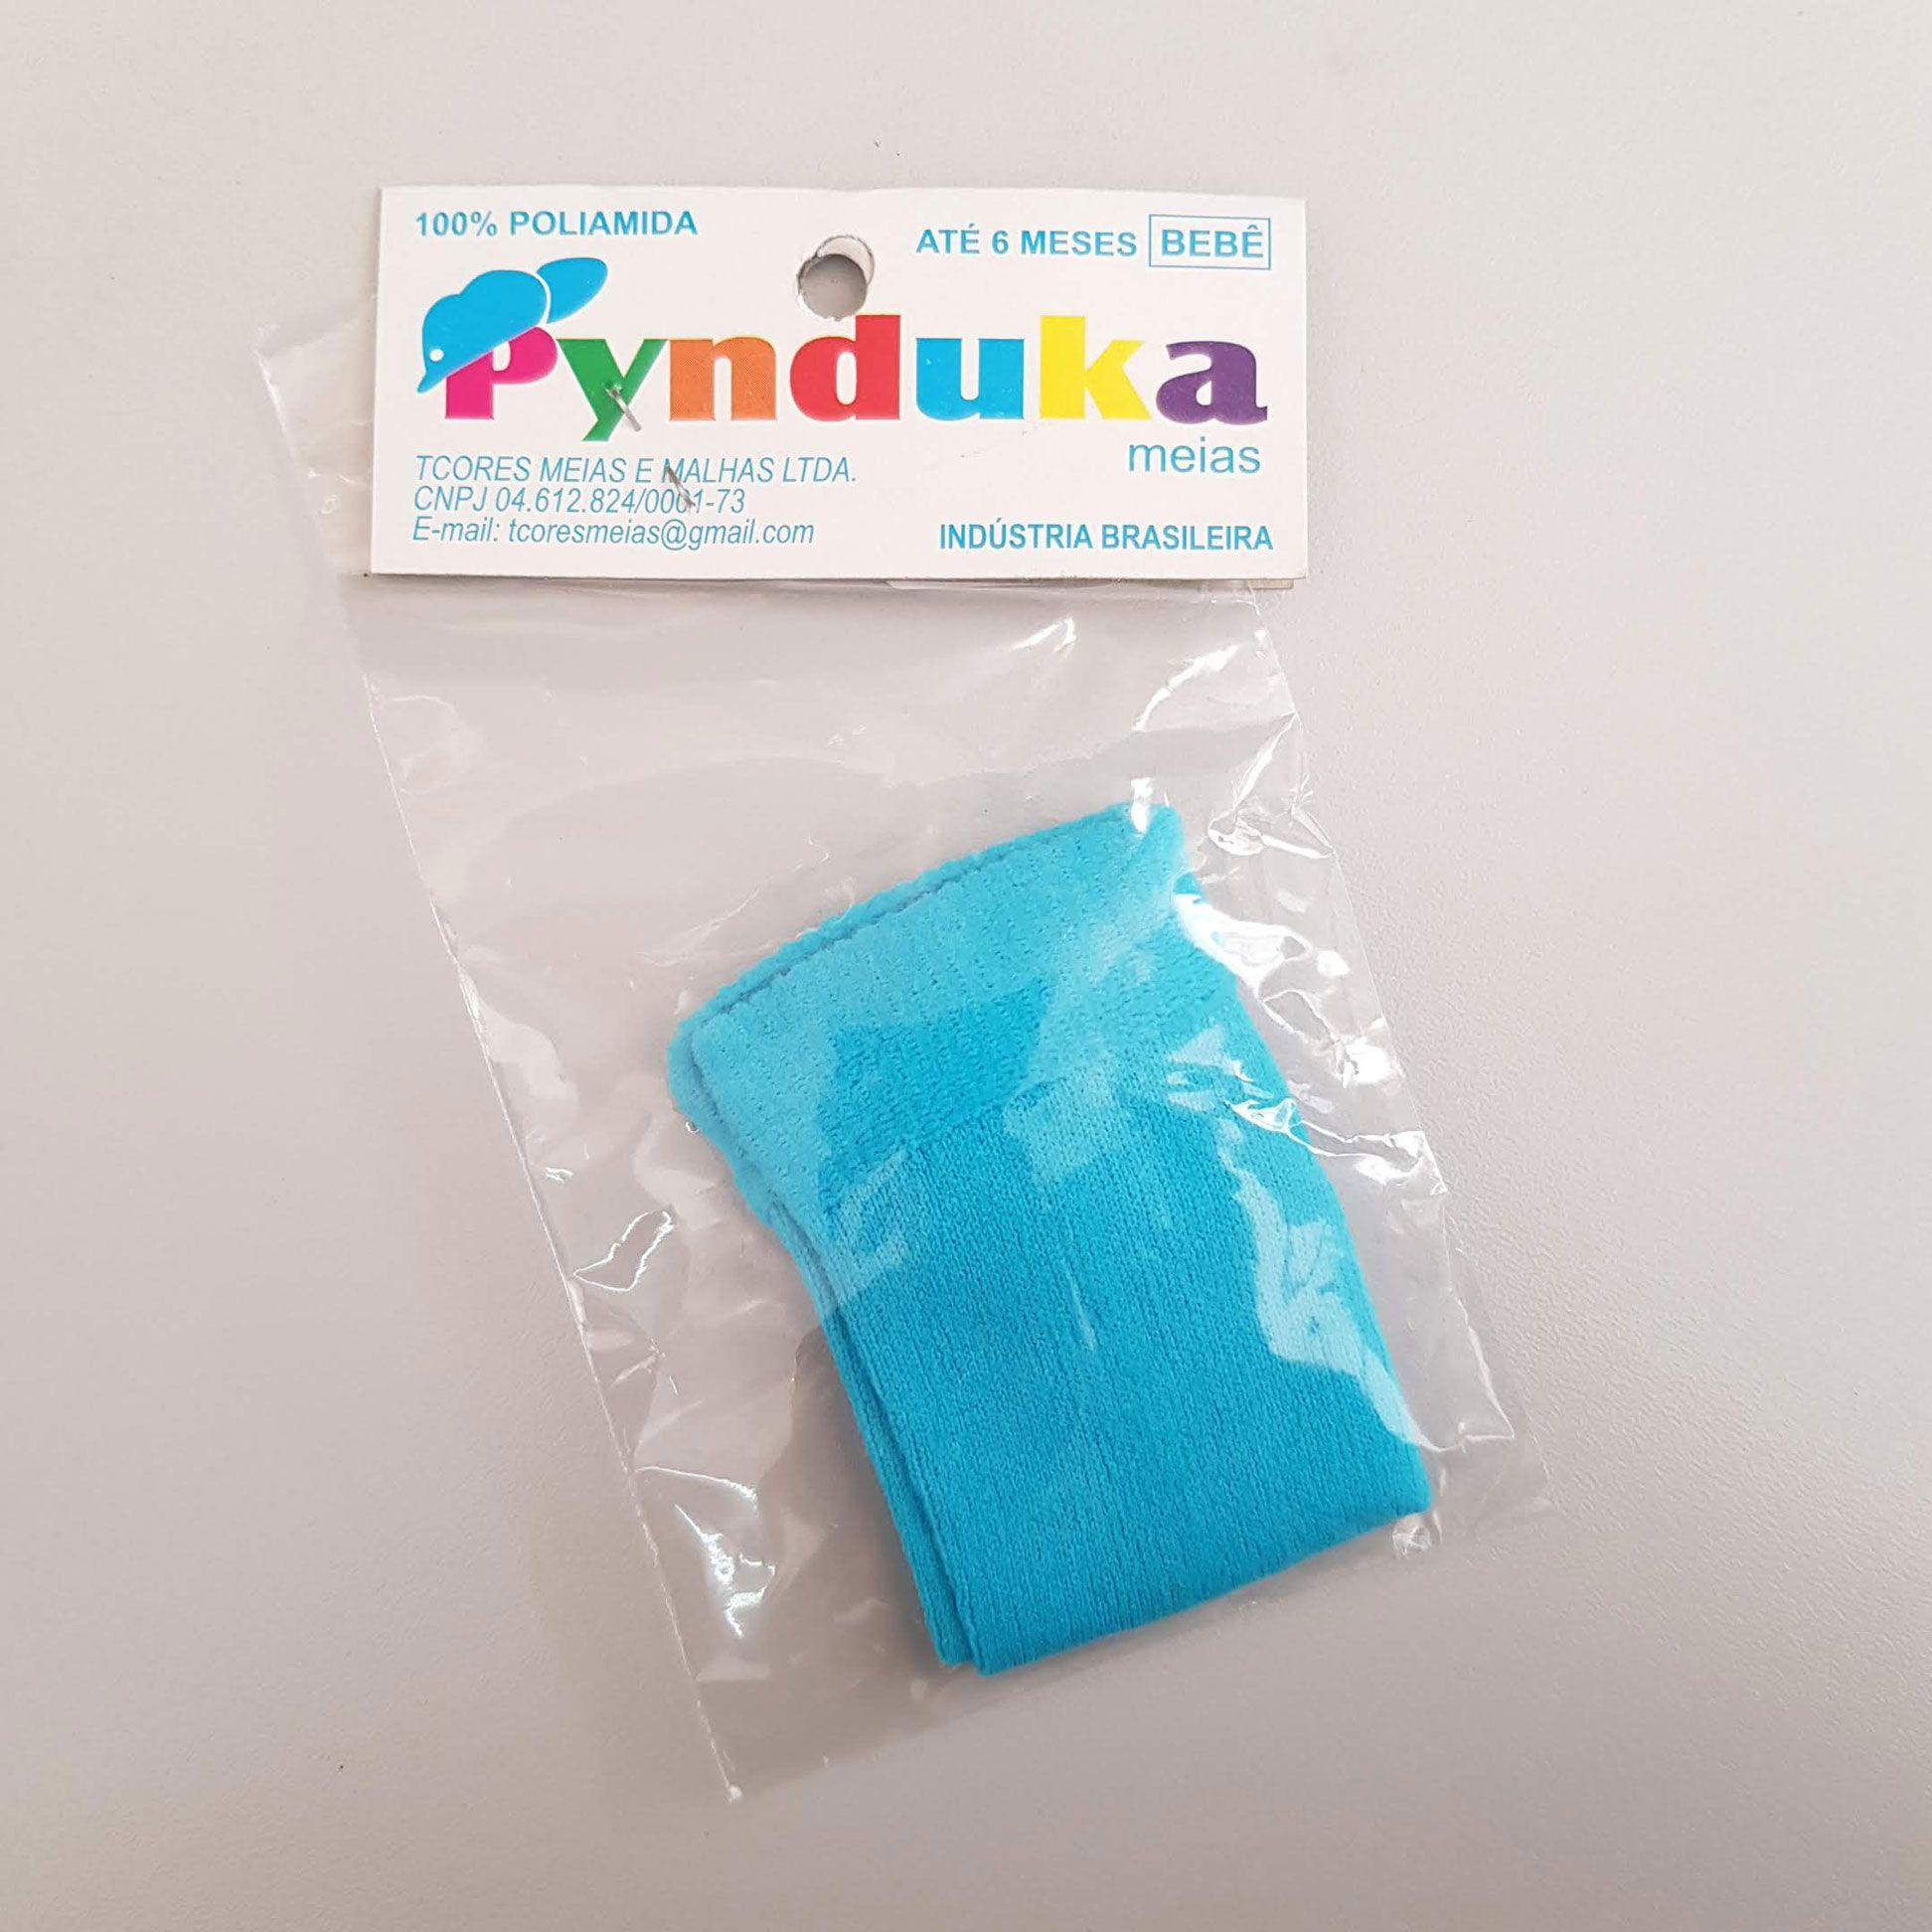 Meia Infantil 0-6 meses 1 par Turquesa - Pynduka